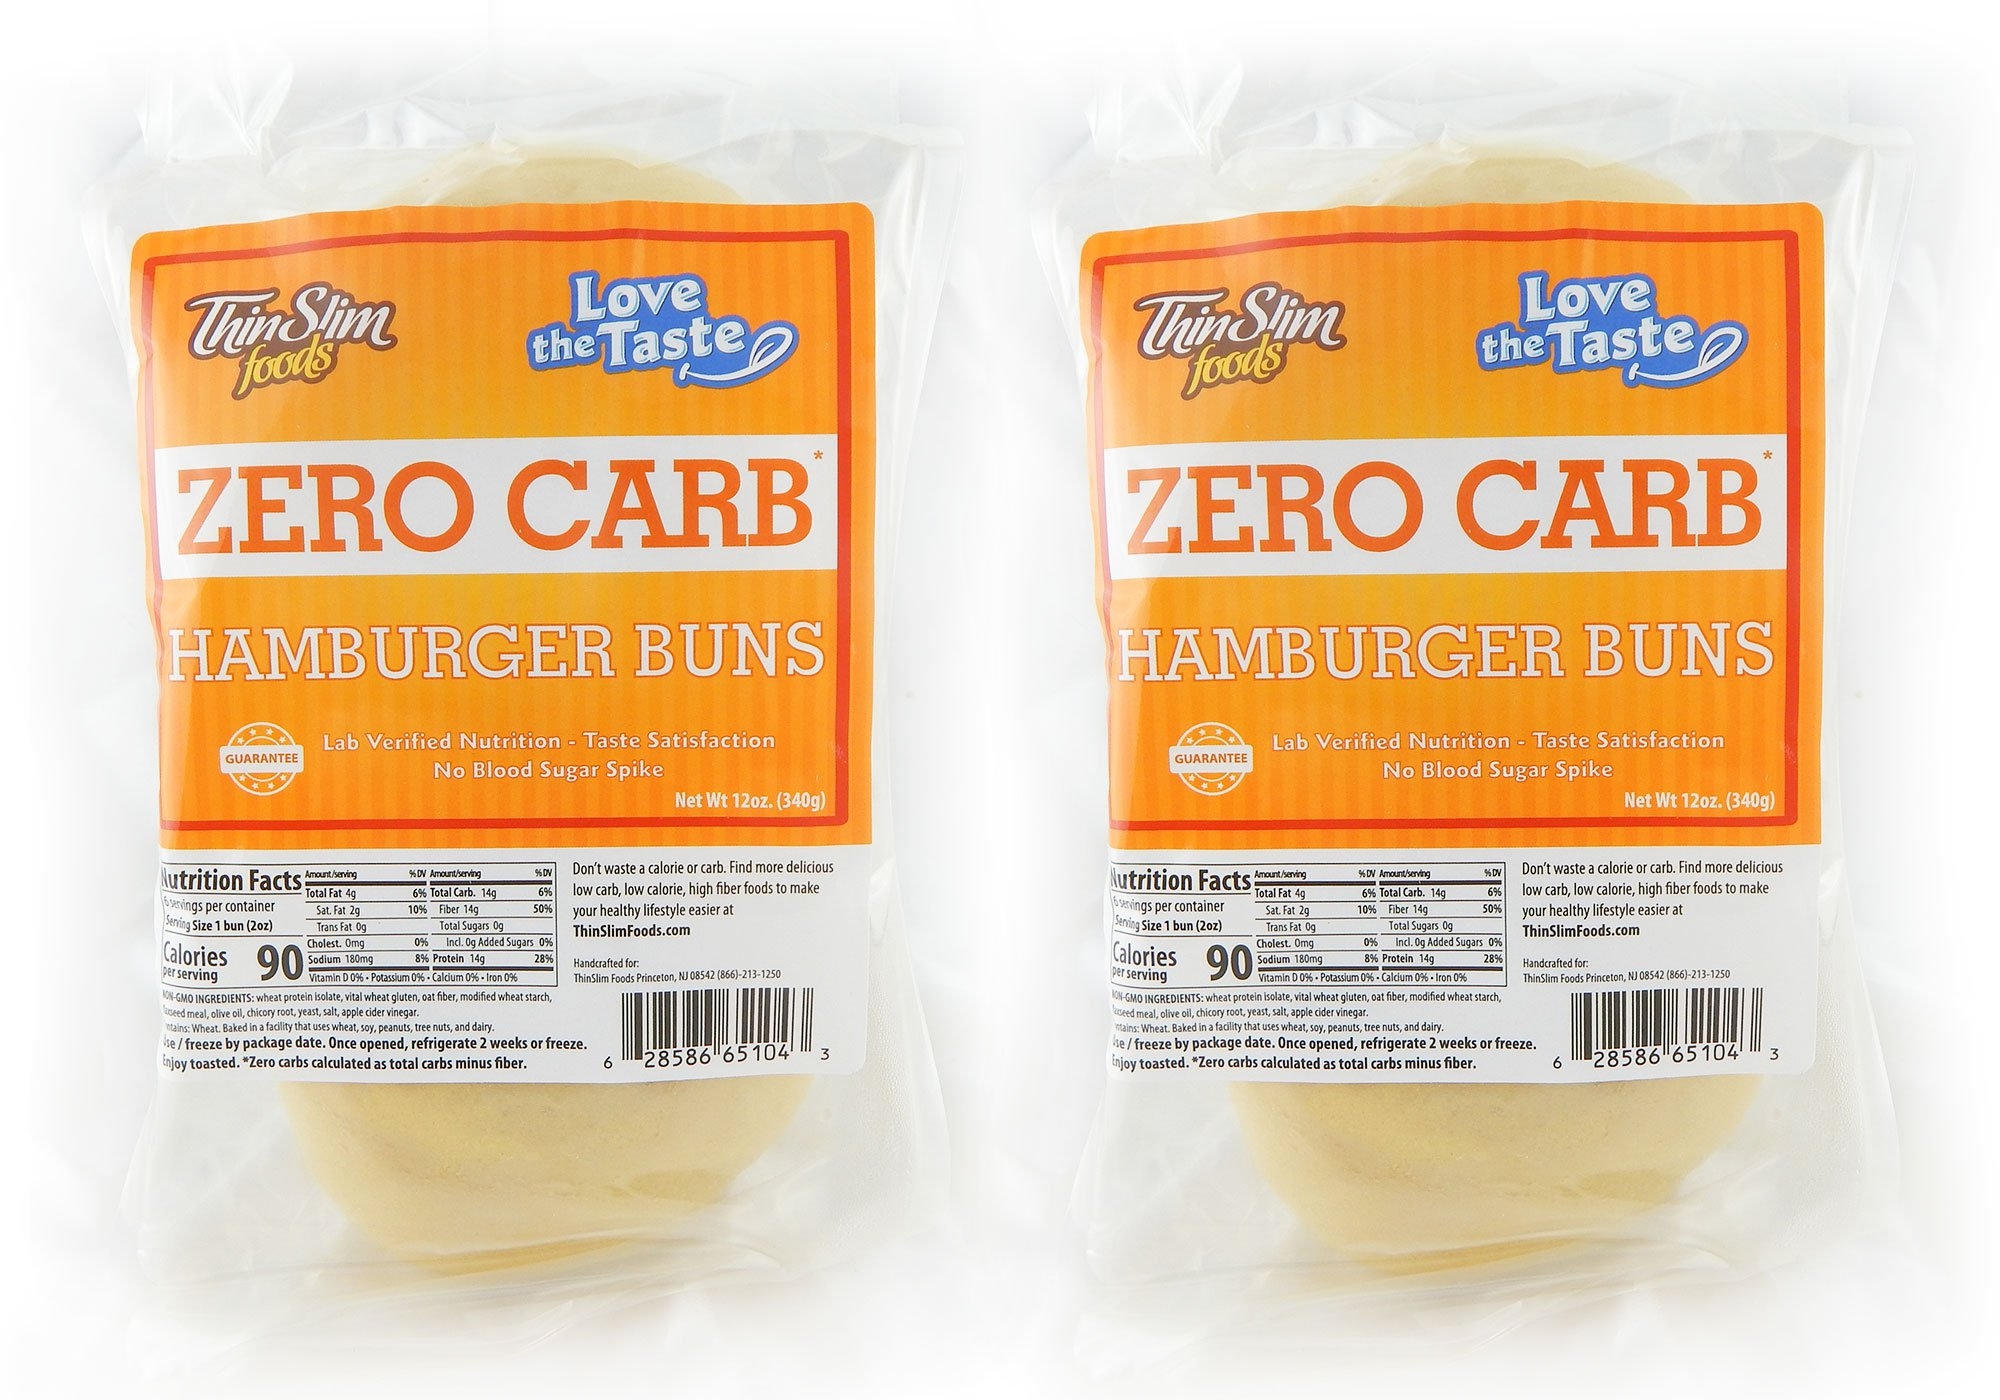 ThinSlim Foods 90 Calorie, 0g Net Carb, Love The Taste Low Carb Hamburger Buns, 2pack